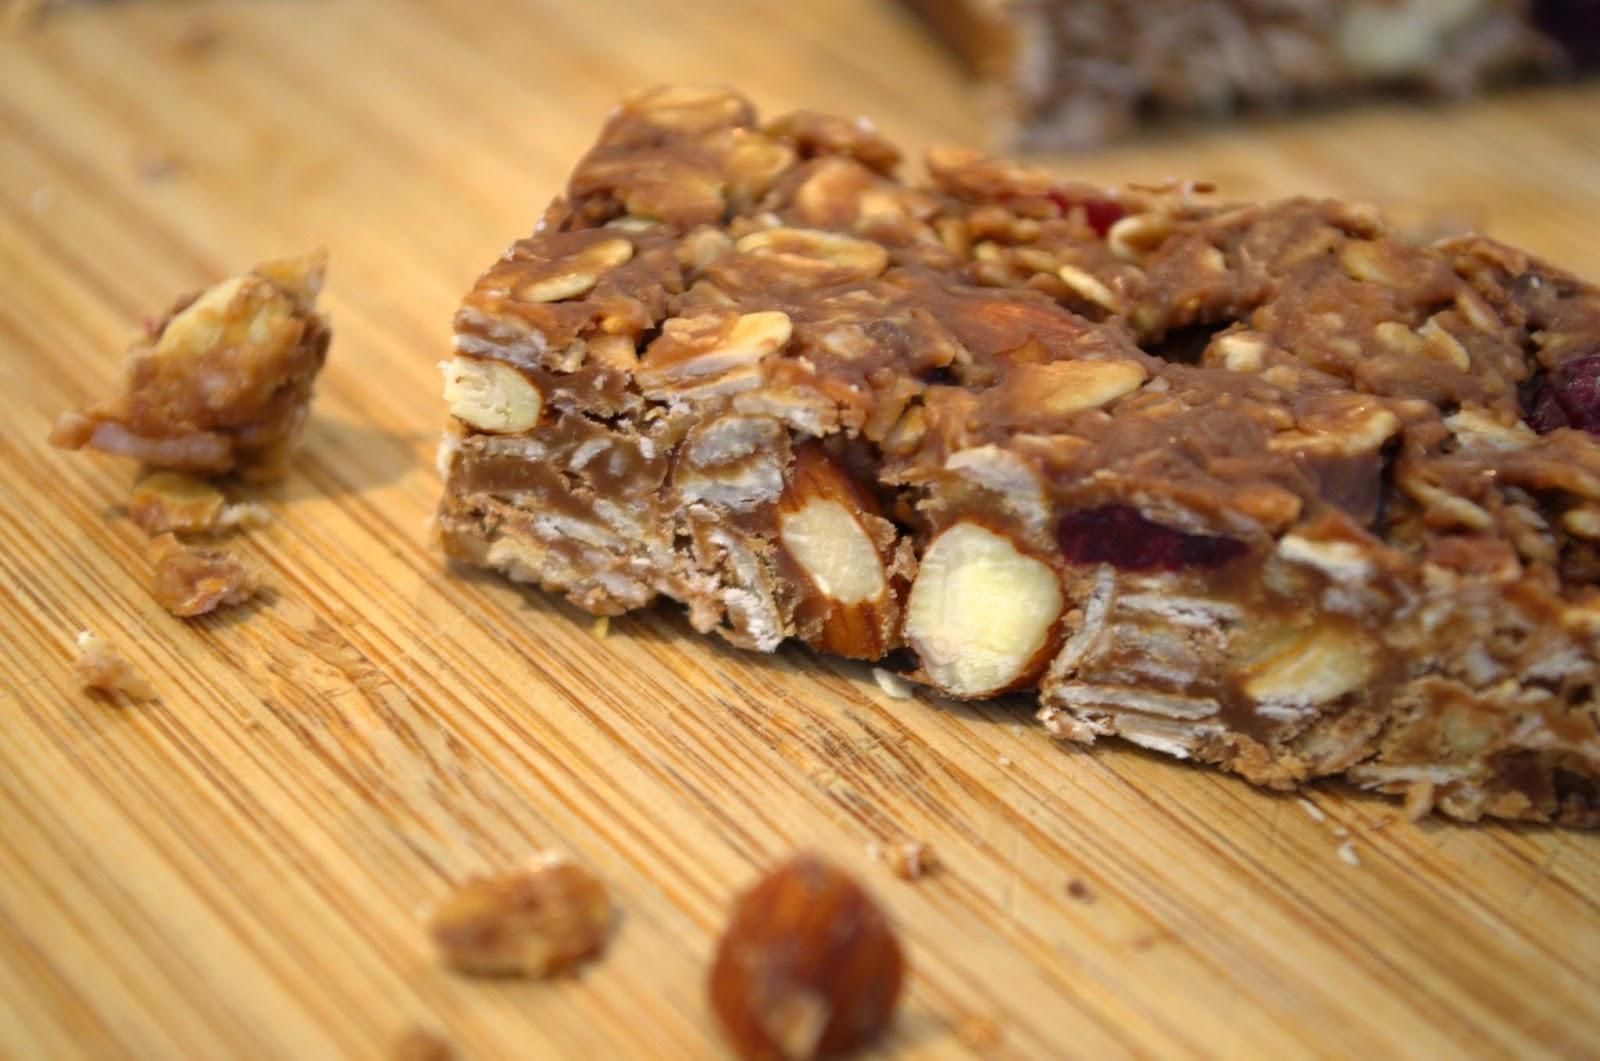 Almond and cranberry muesli bars